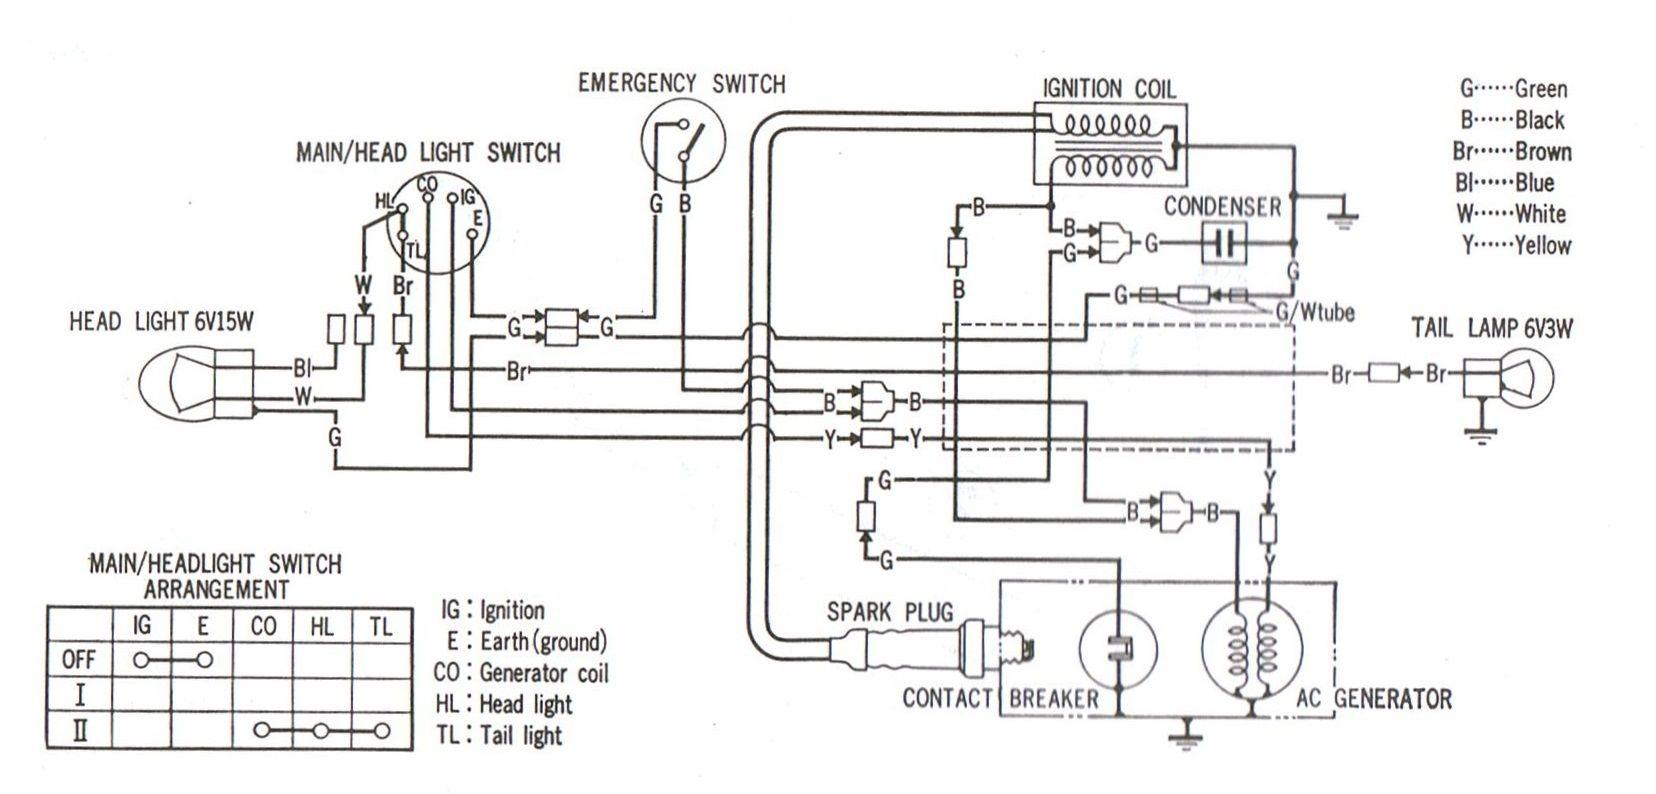 extraordinary 1982 honda c70 passport wiring diagram gallery best volvo c70 wiring diagram pdf c70 wiring diagram [ 1656 x 794 Pixel ]